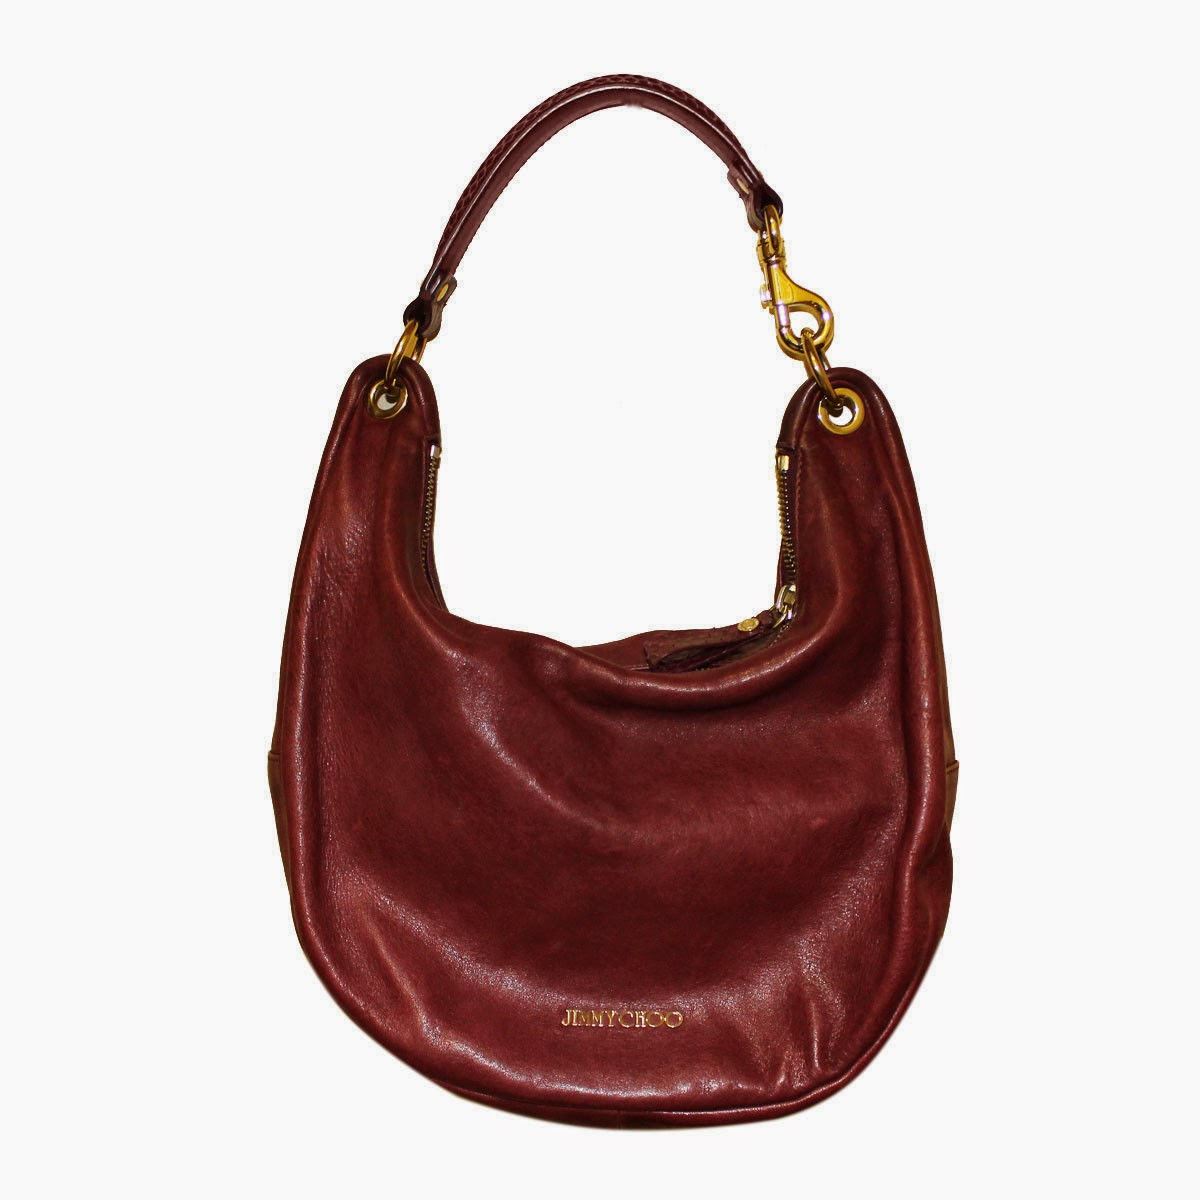 jimmy choo handbags - HD1200×1200